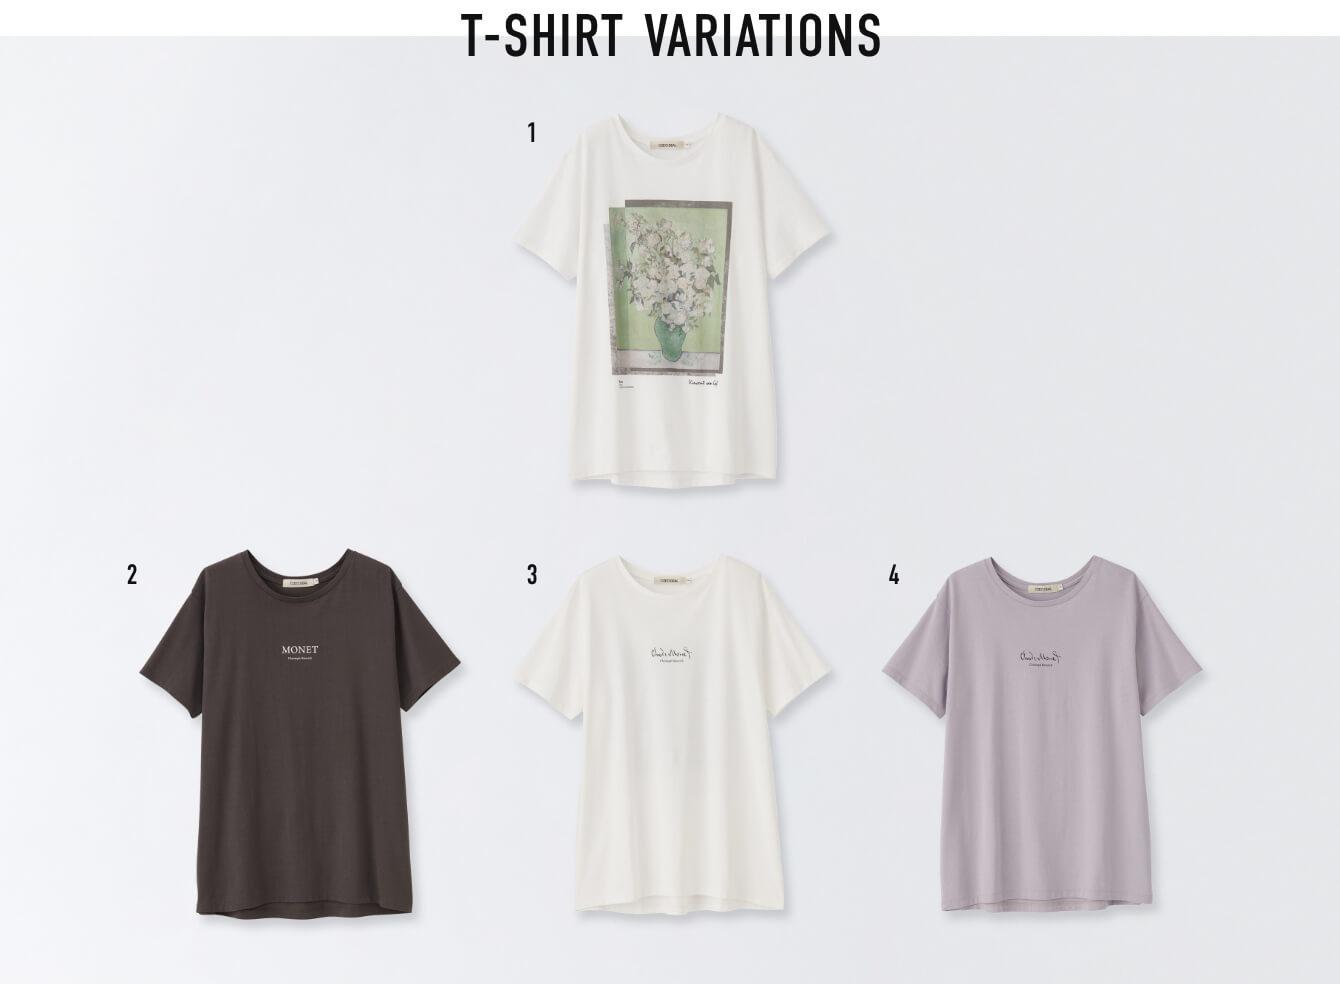 T-SHIRT VARIATIONS